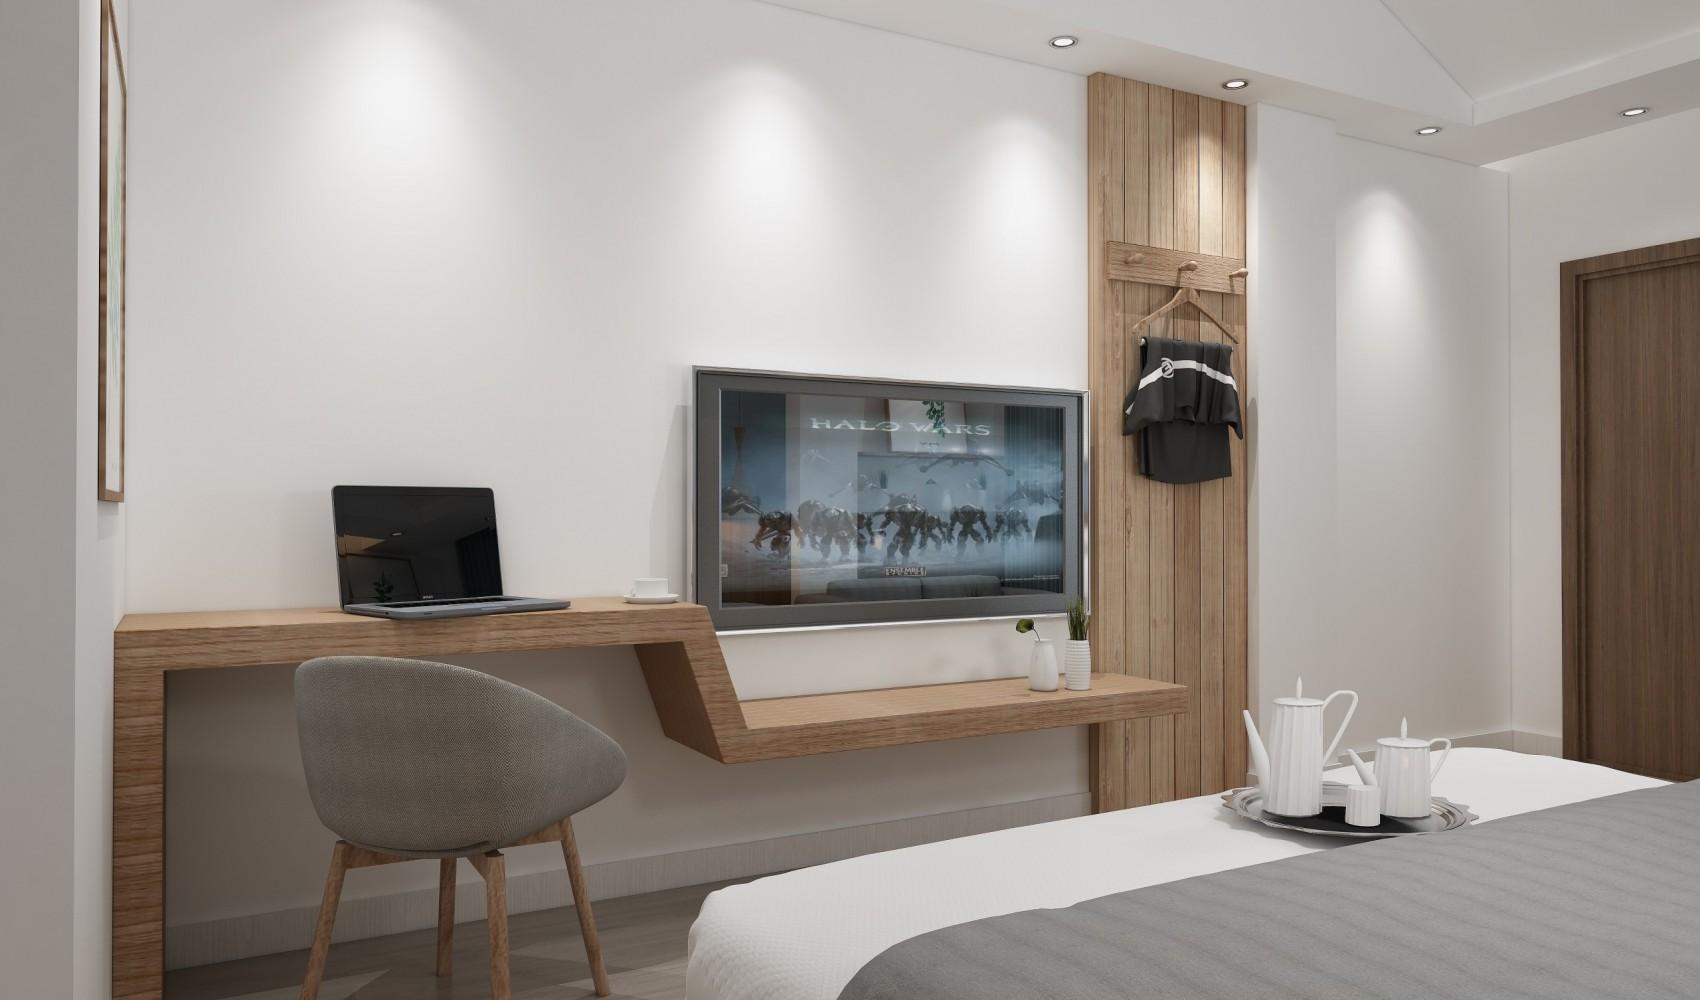 Home Renovation and Design